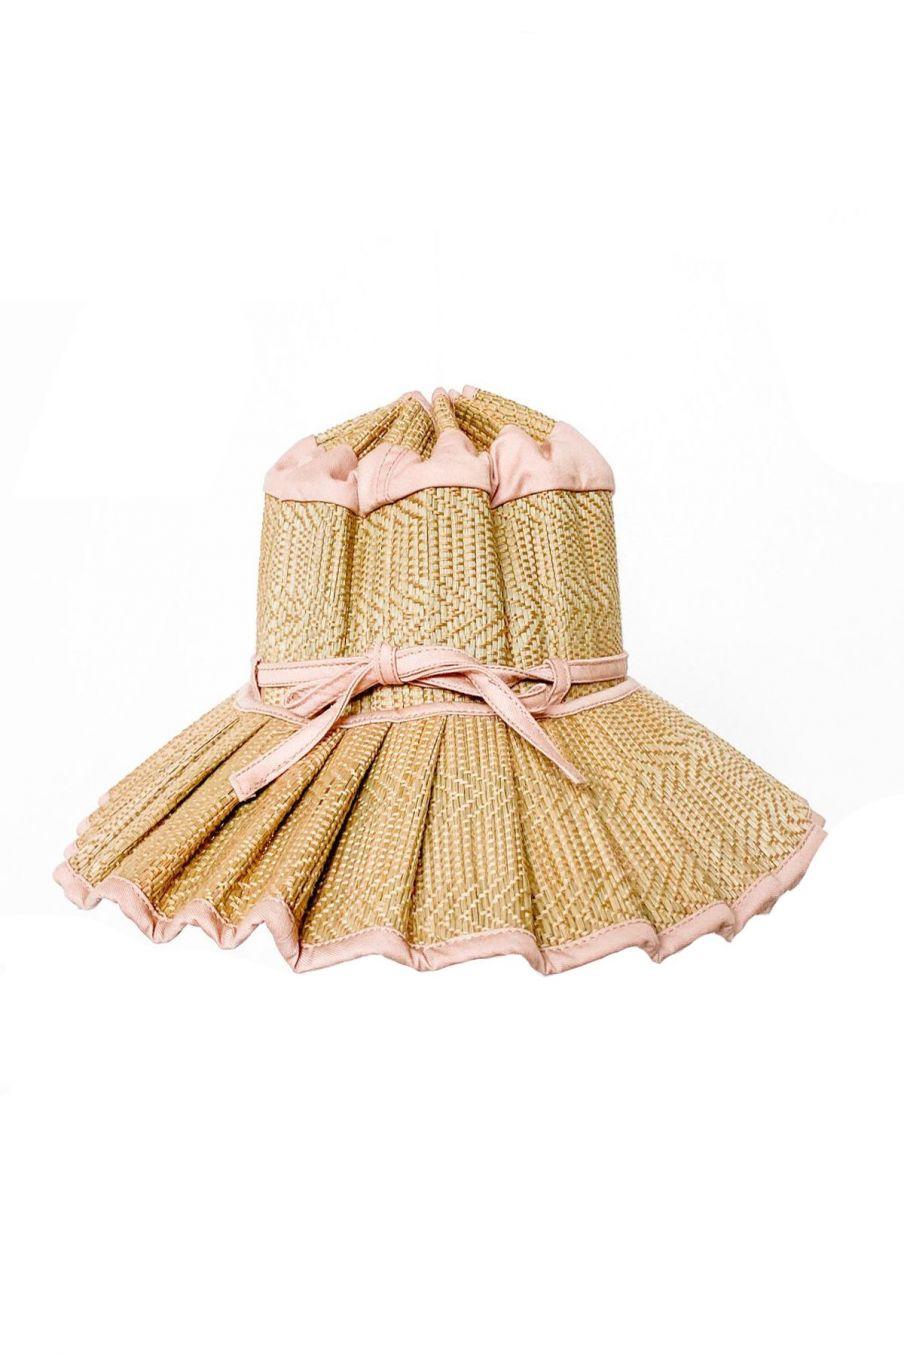 boheme chic vintage chapeau fille capri sumatra